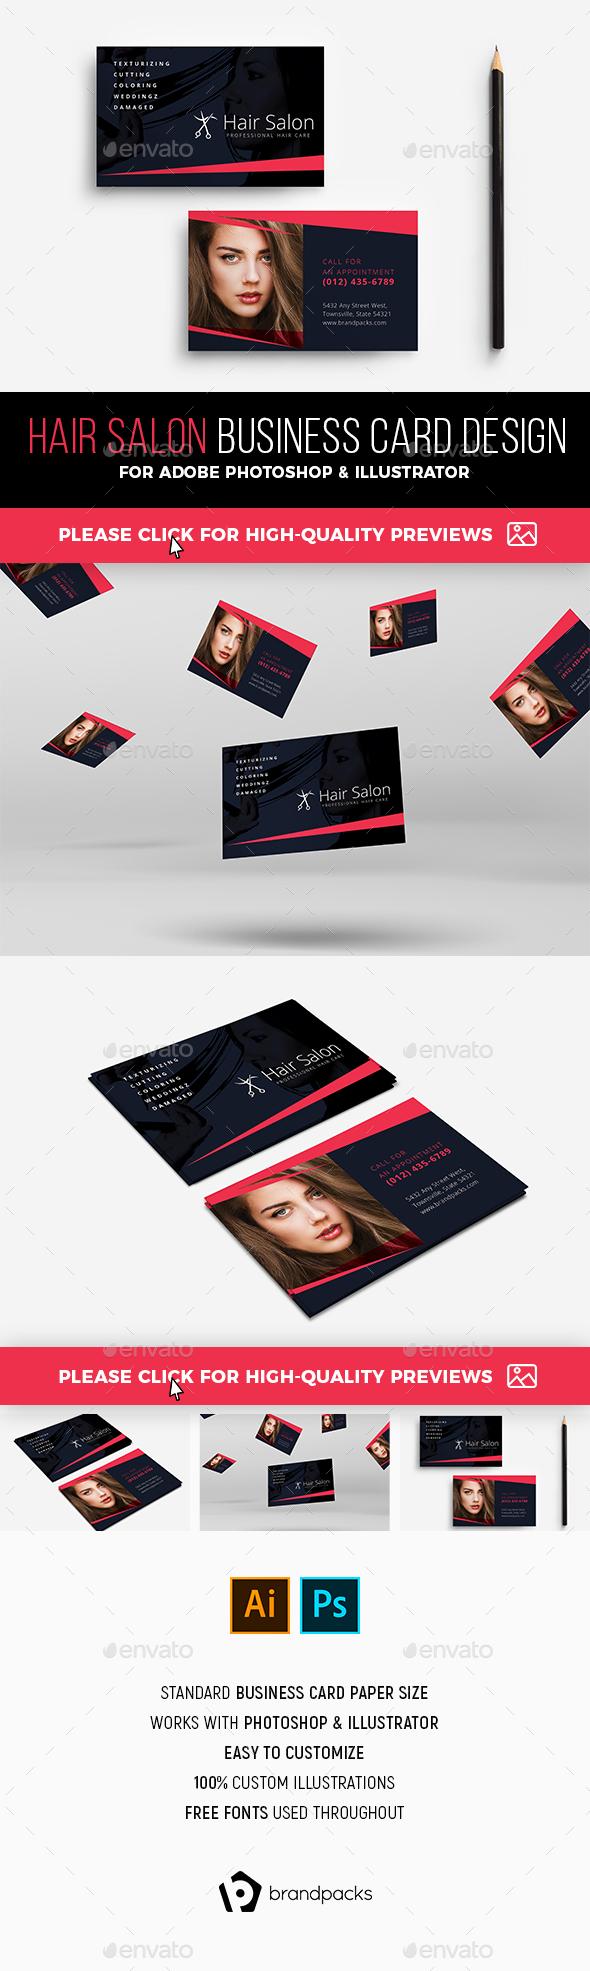 Hair Salon Business Card Graphics, Designs & Templates